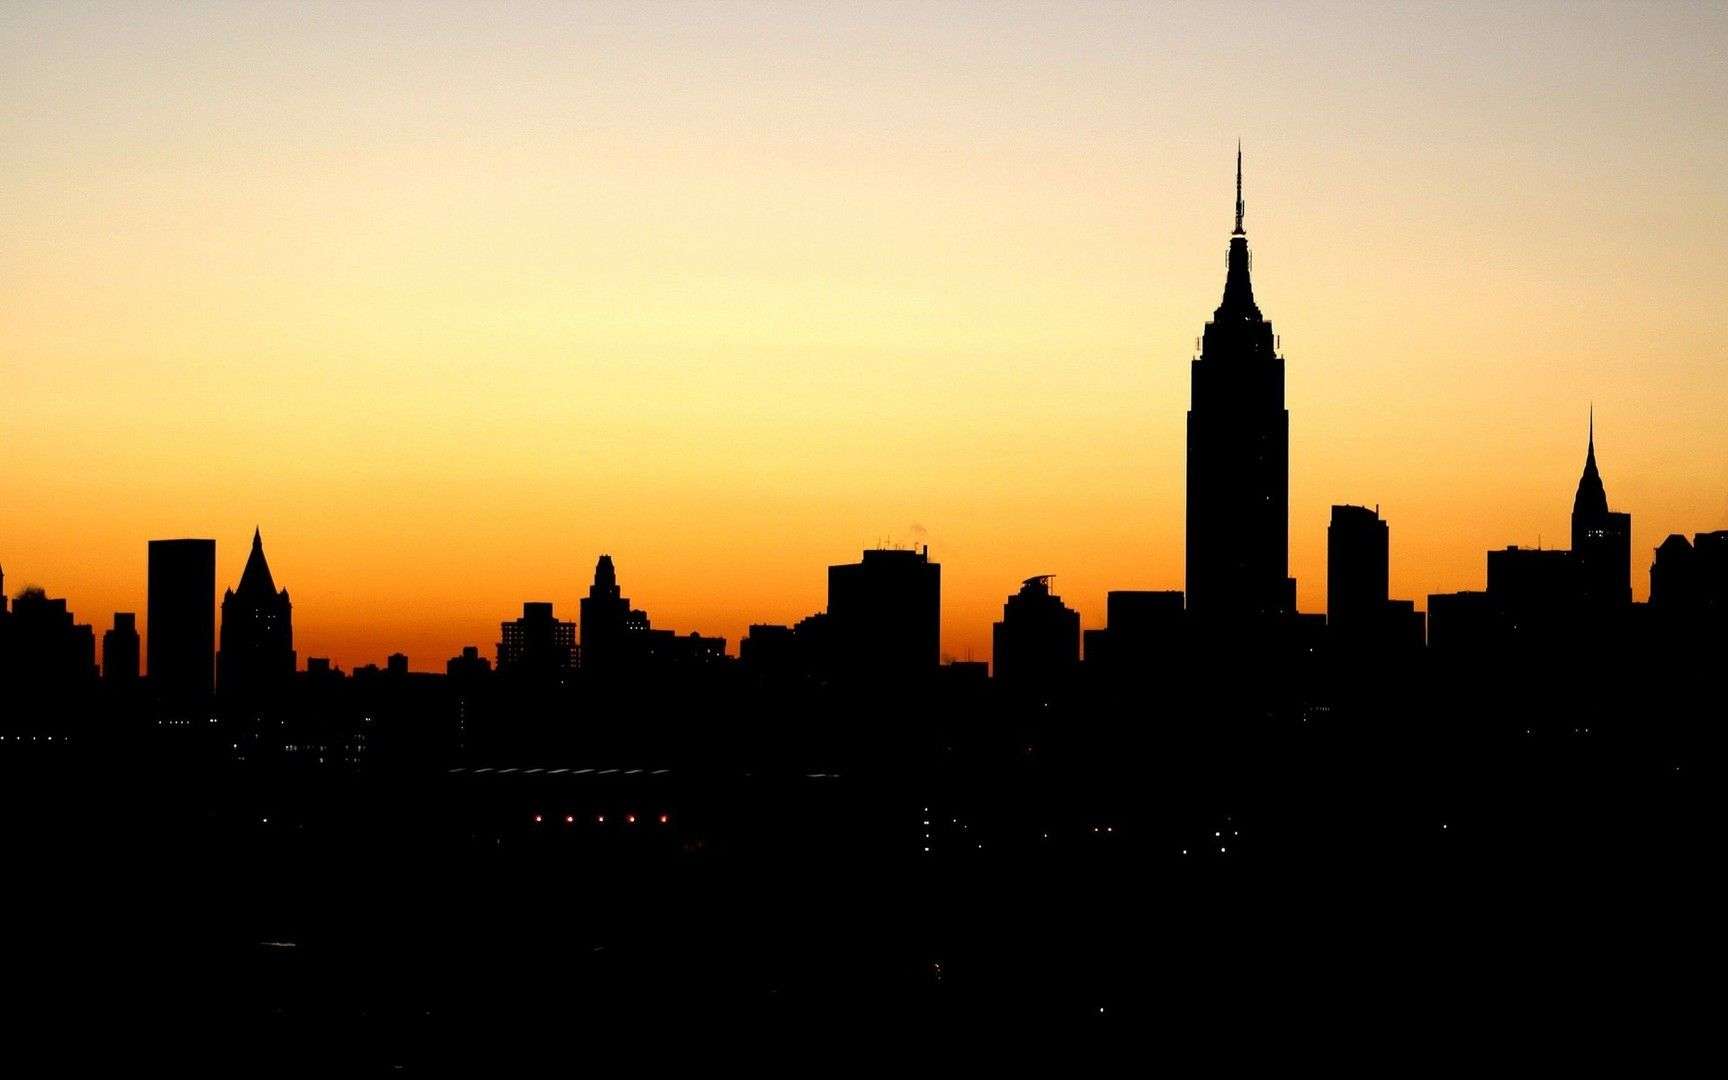 new york skyline google search cityscapes impressive metropolis architecture pinterest. Black Bedroom Furniture Sets. Home Design Ideas